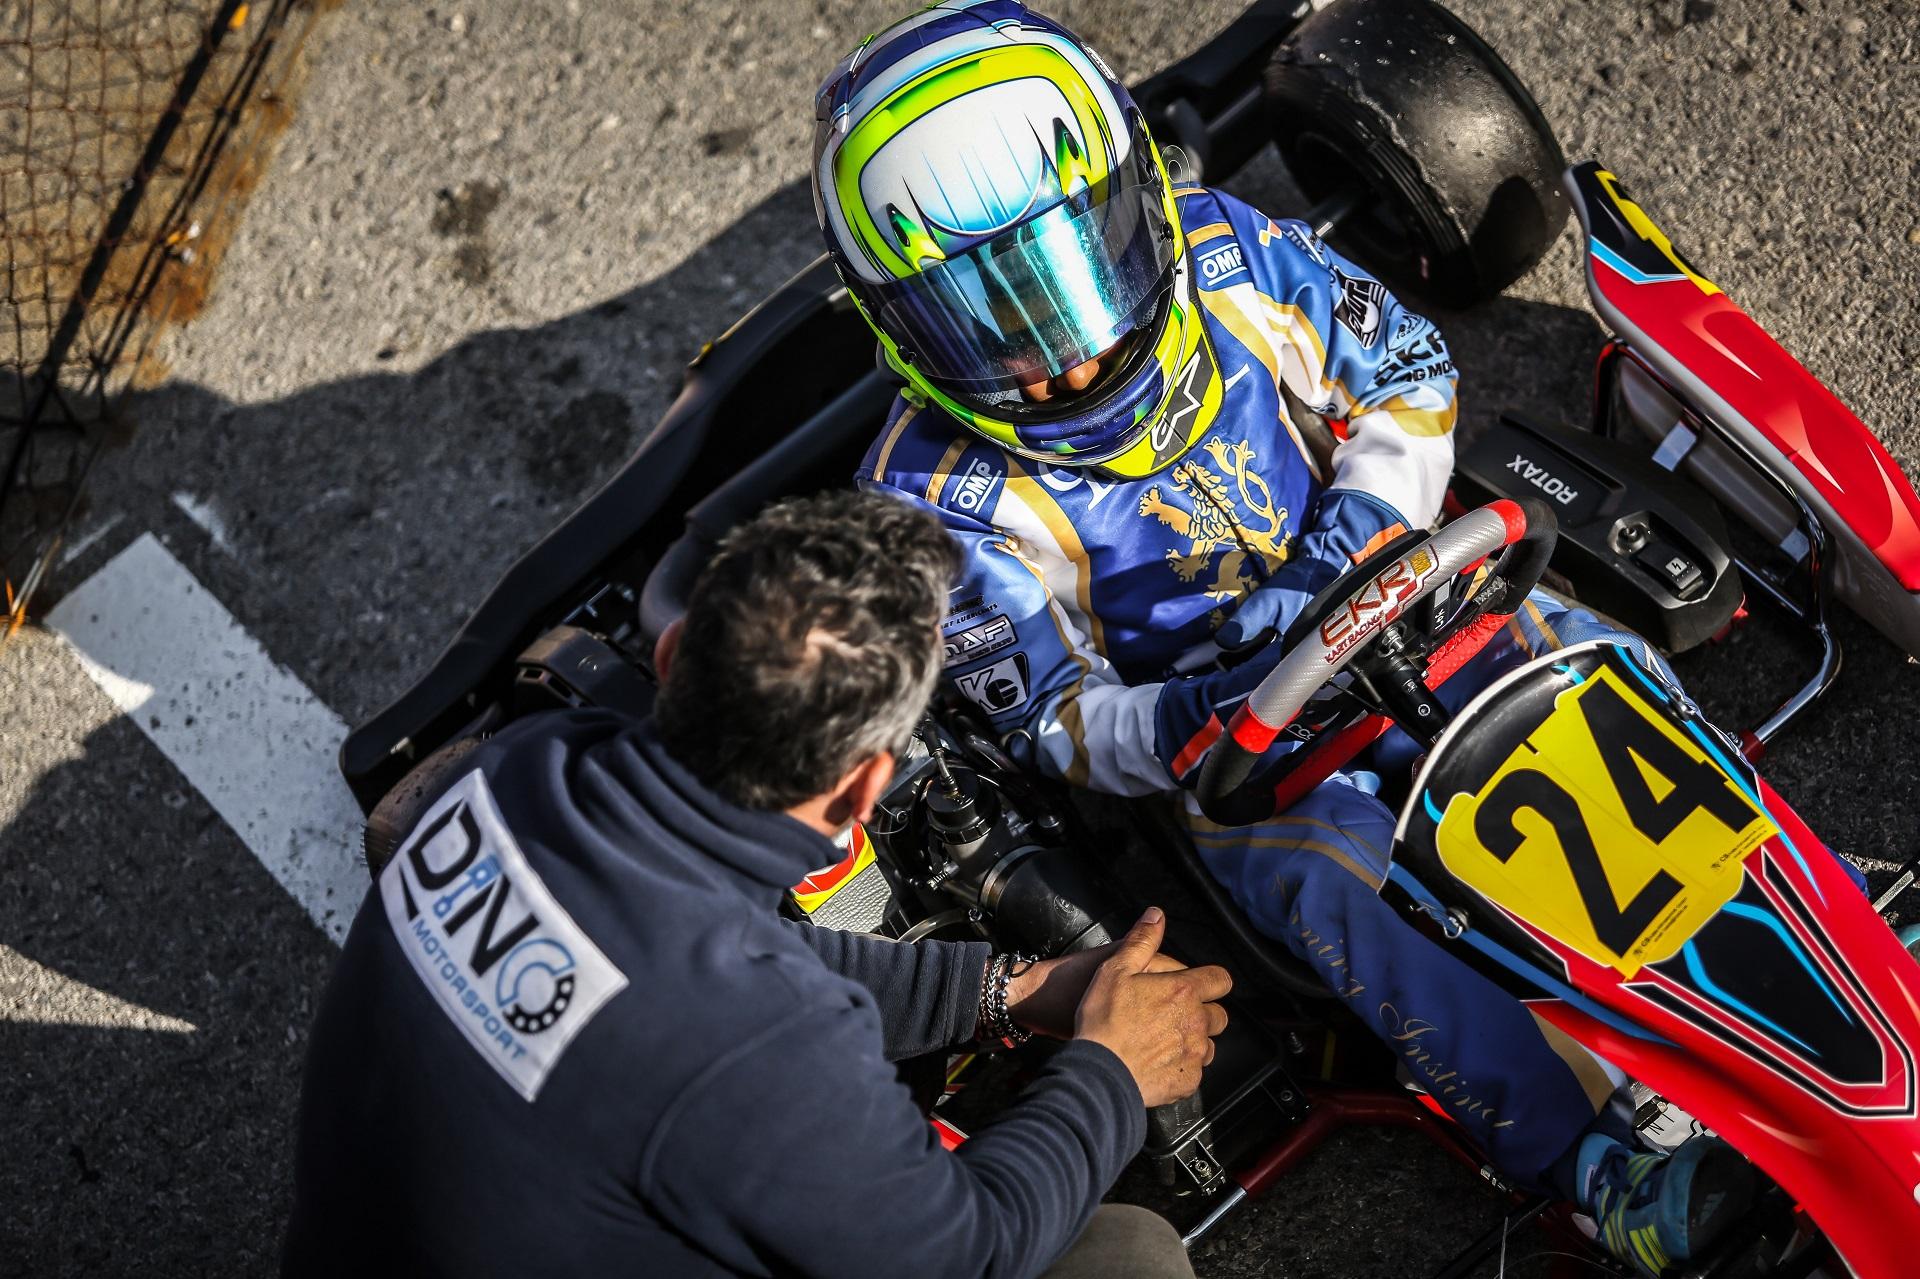 Lorenzo Campos 8.º nos 'cronos' da Rotax Winter Cup da categoria Micro-Max